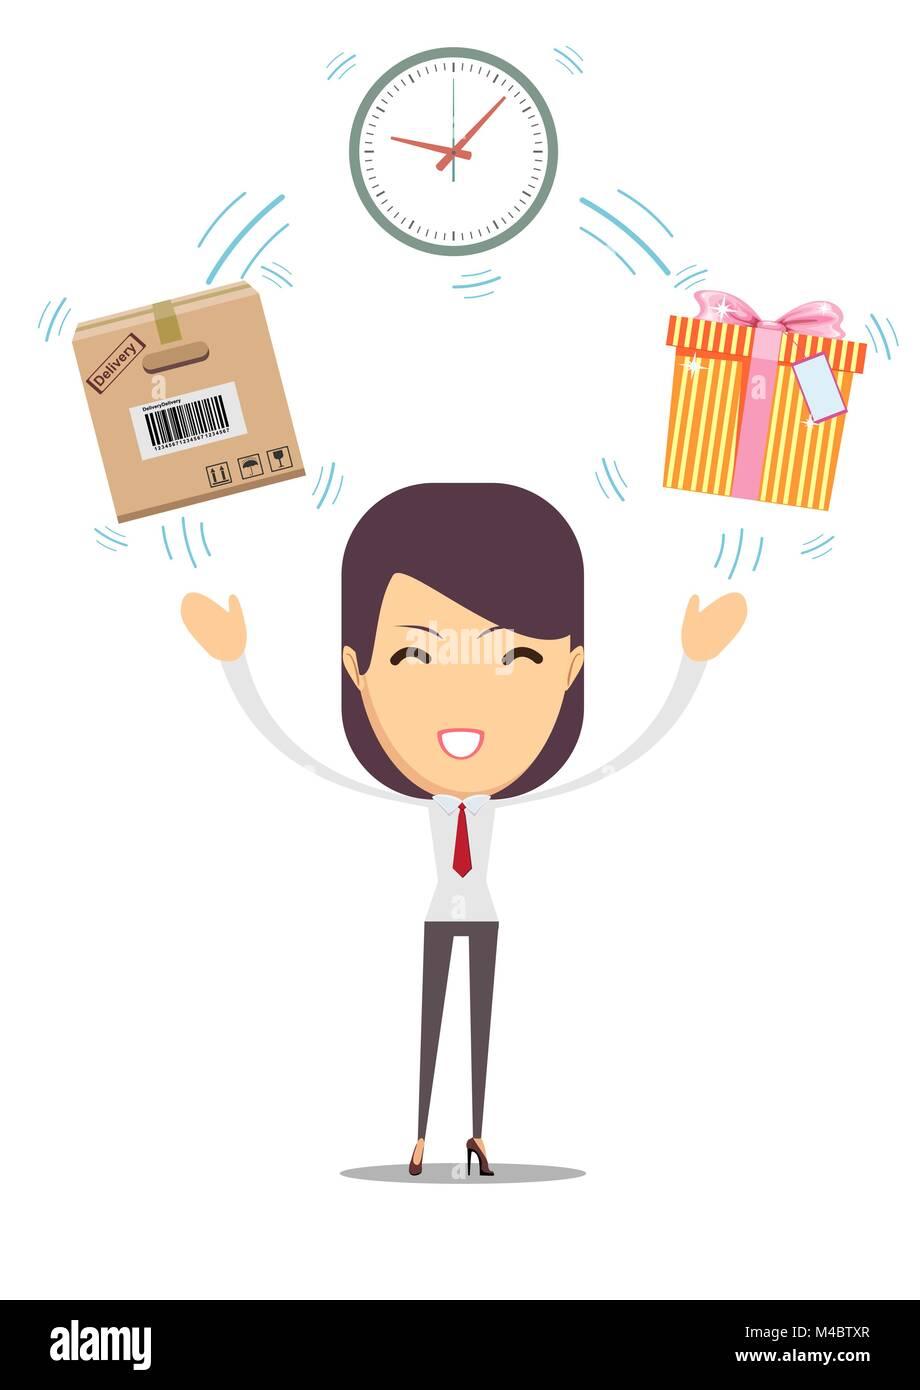 Postal fast service - fast transfer. - Stock Vector